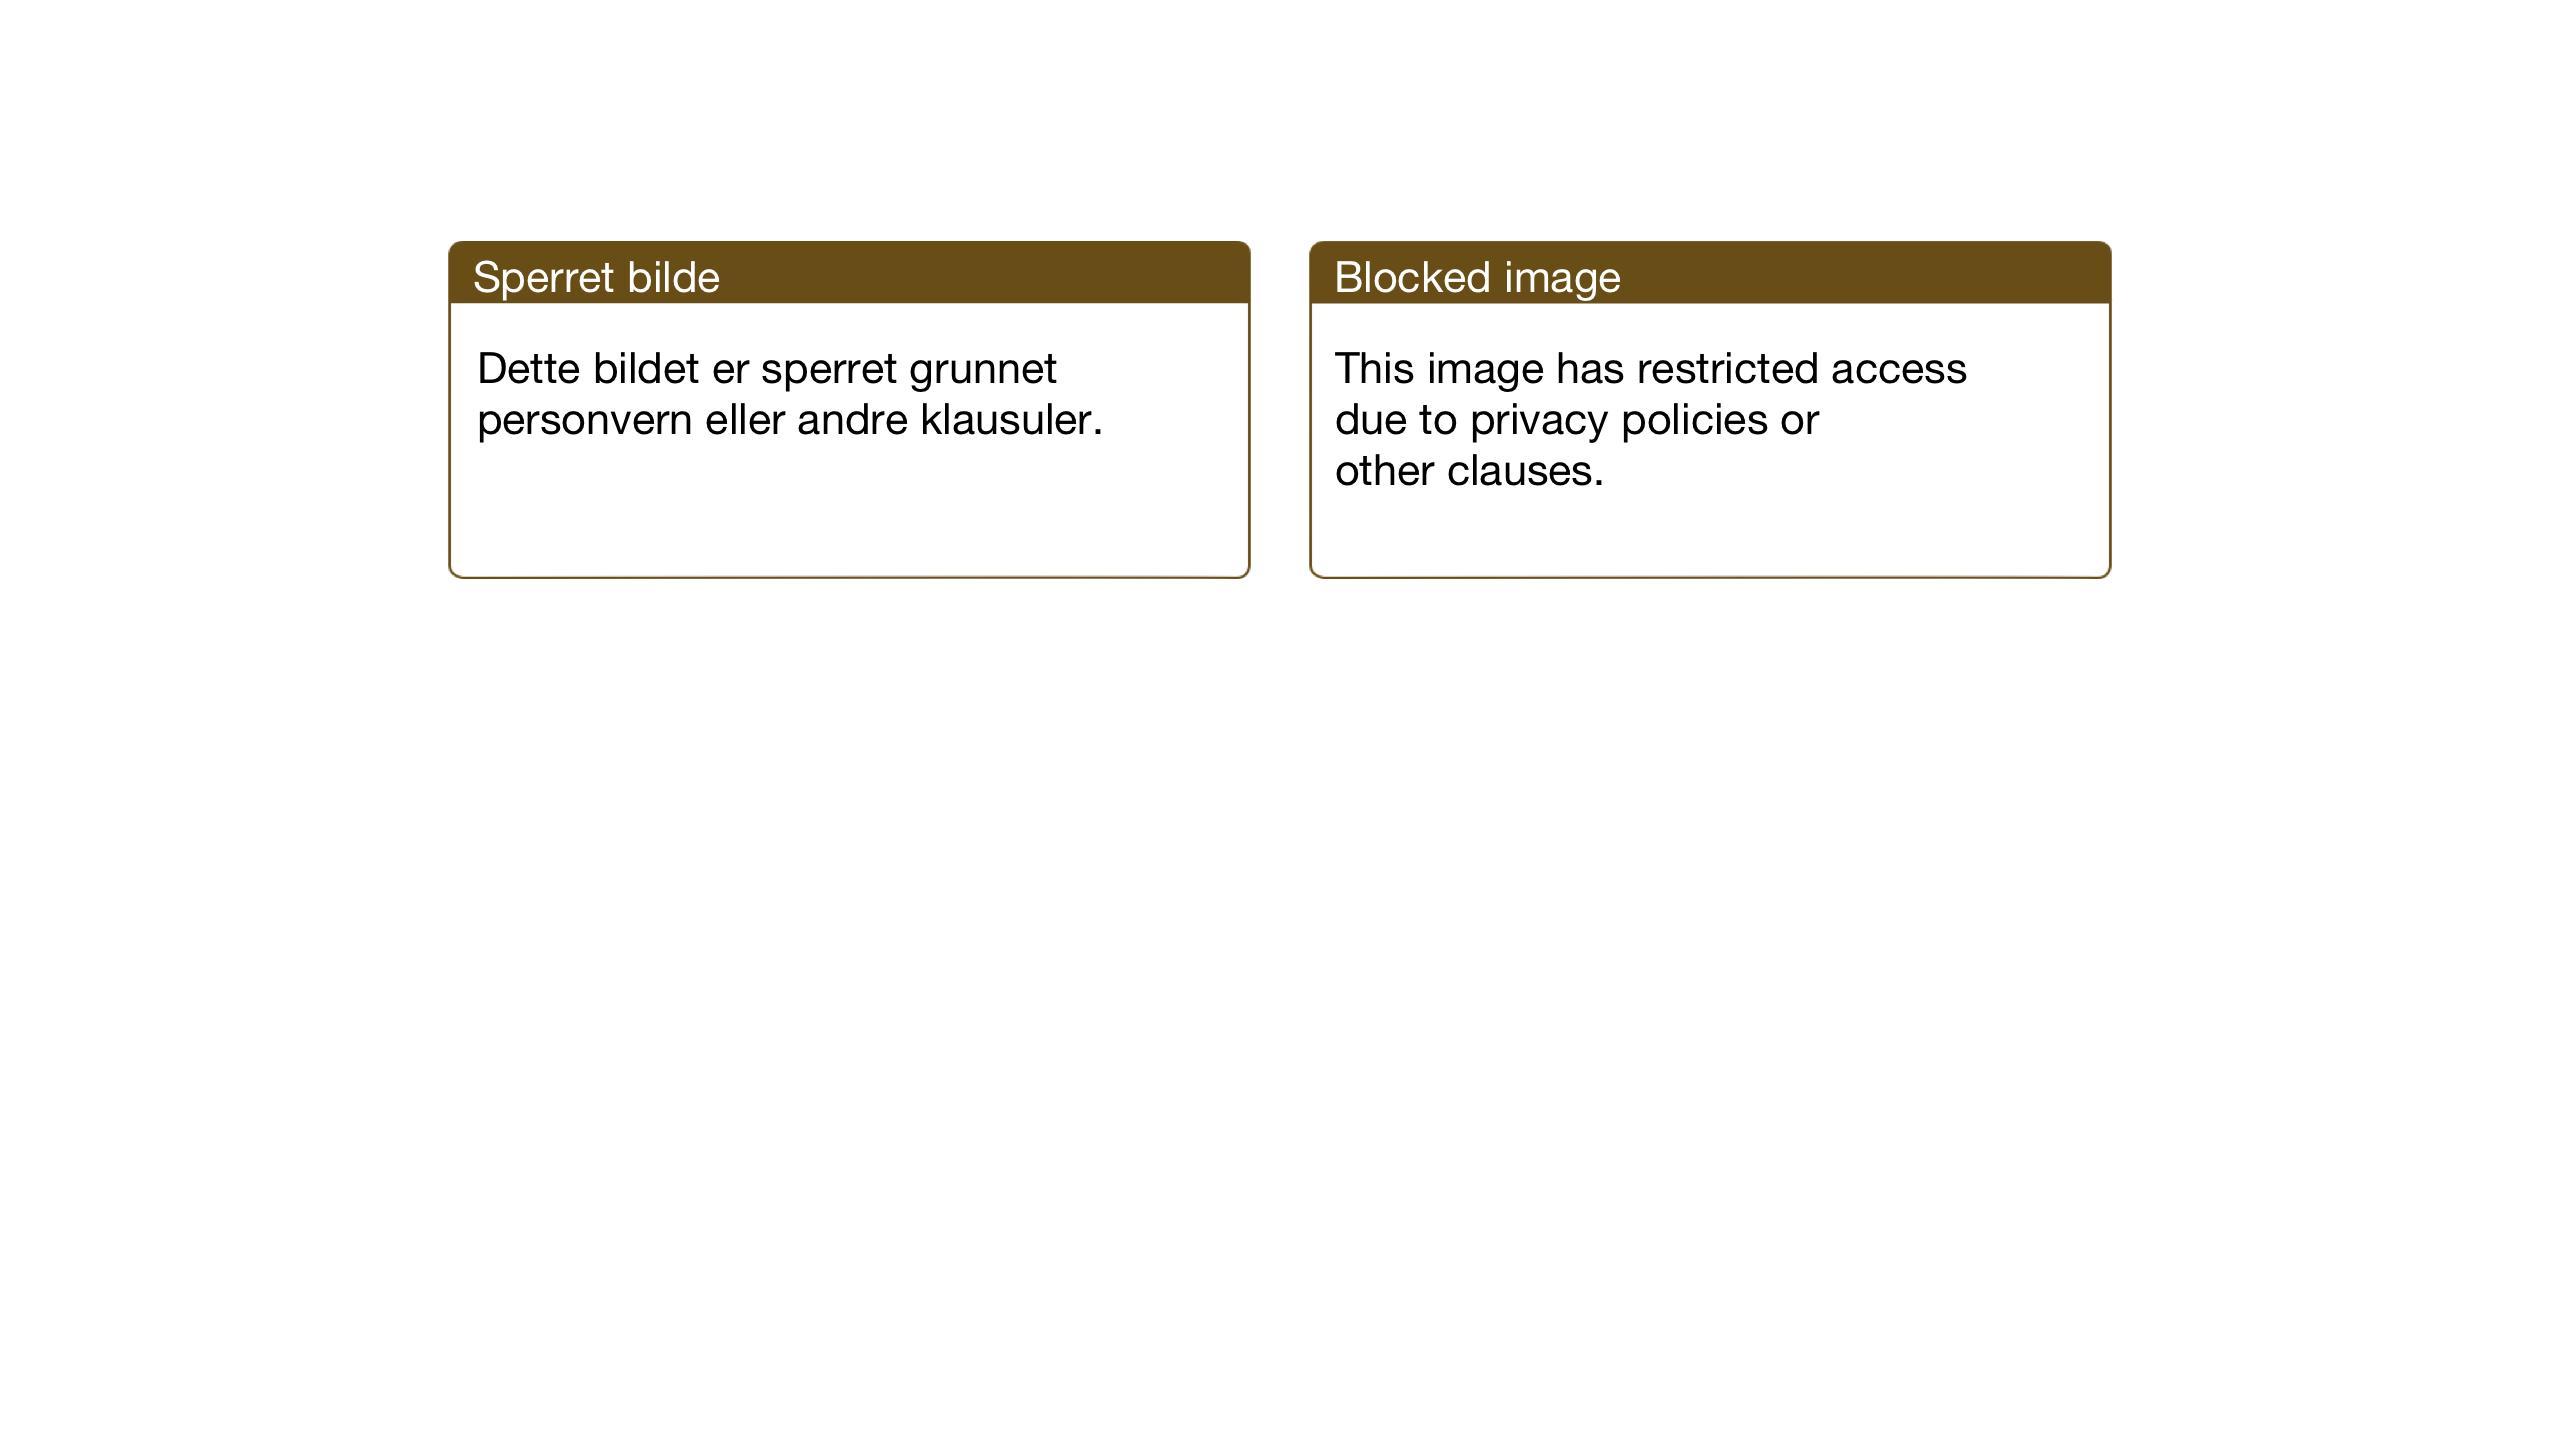 SAT, Ministerialprotokoller, klokkerbøker og fødselsregistre - Sør-Trøndelag, 633/L0521: Parish register (copy) no. 633C03, 1921-1941, p. 90